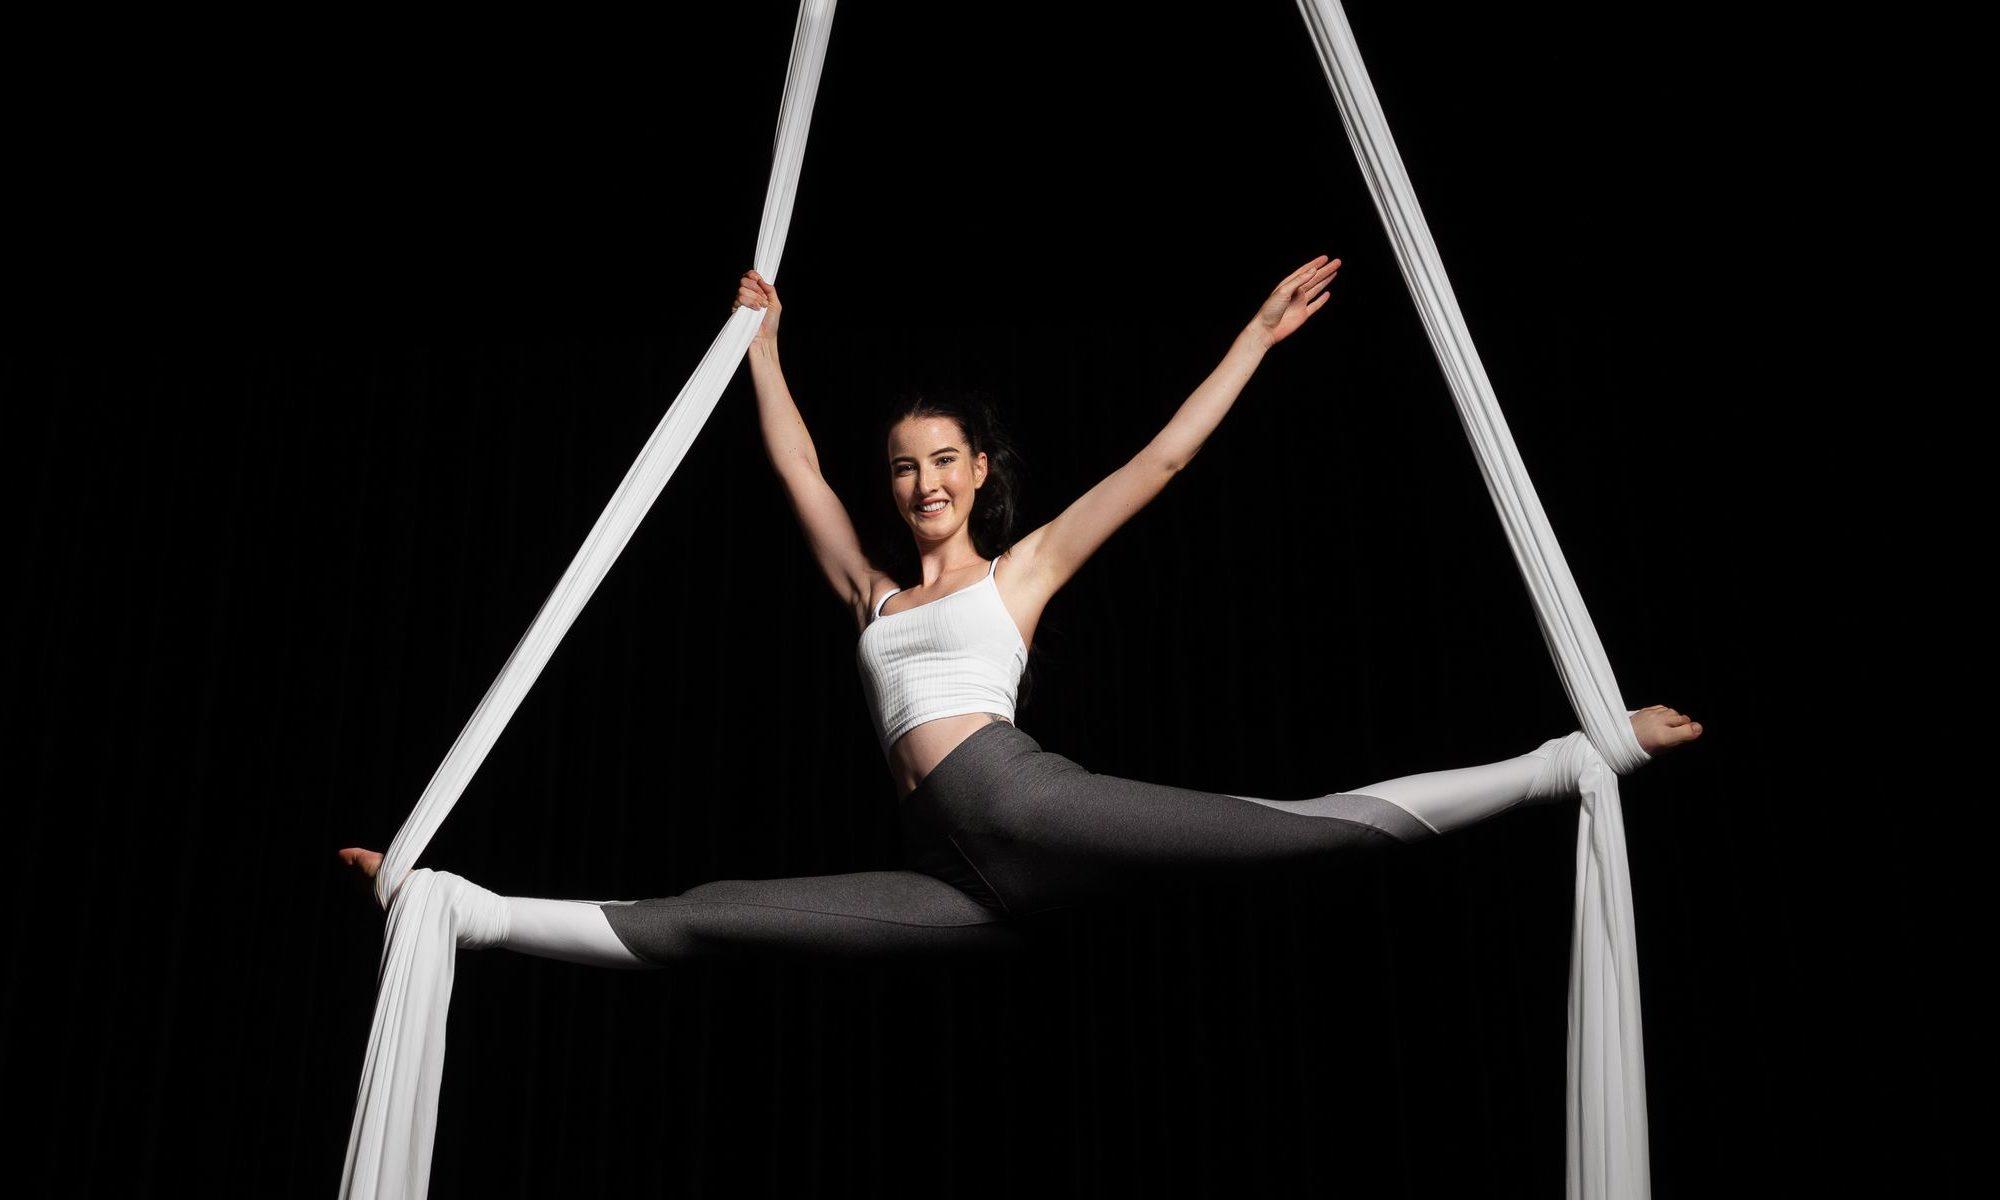 Aerial Silk Luftakrobatik | Merith Seibert im Circus Center Bruck/Mur